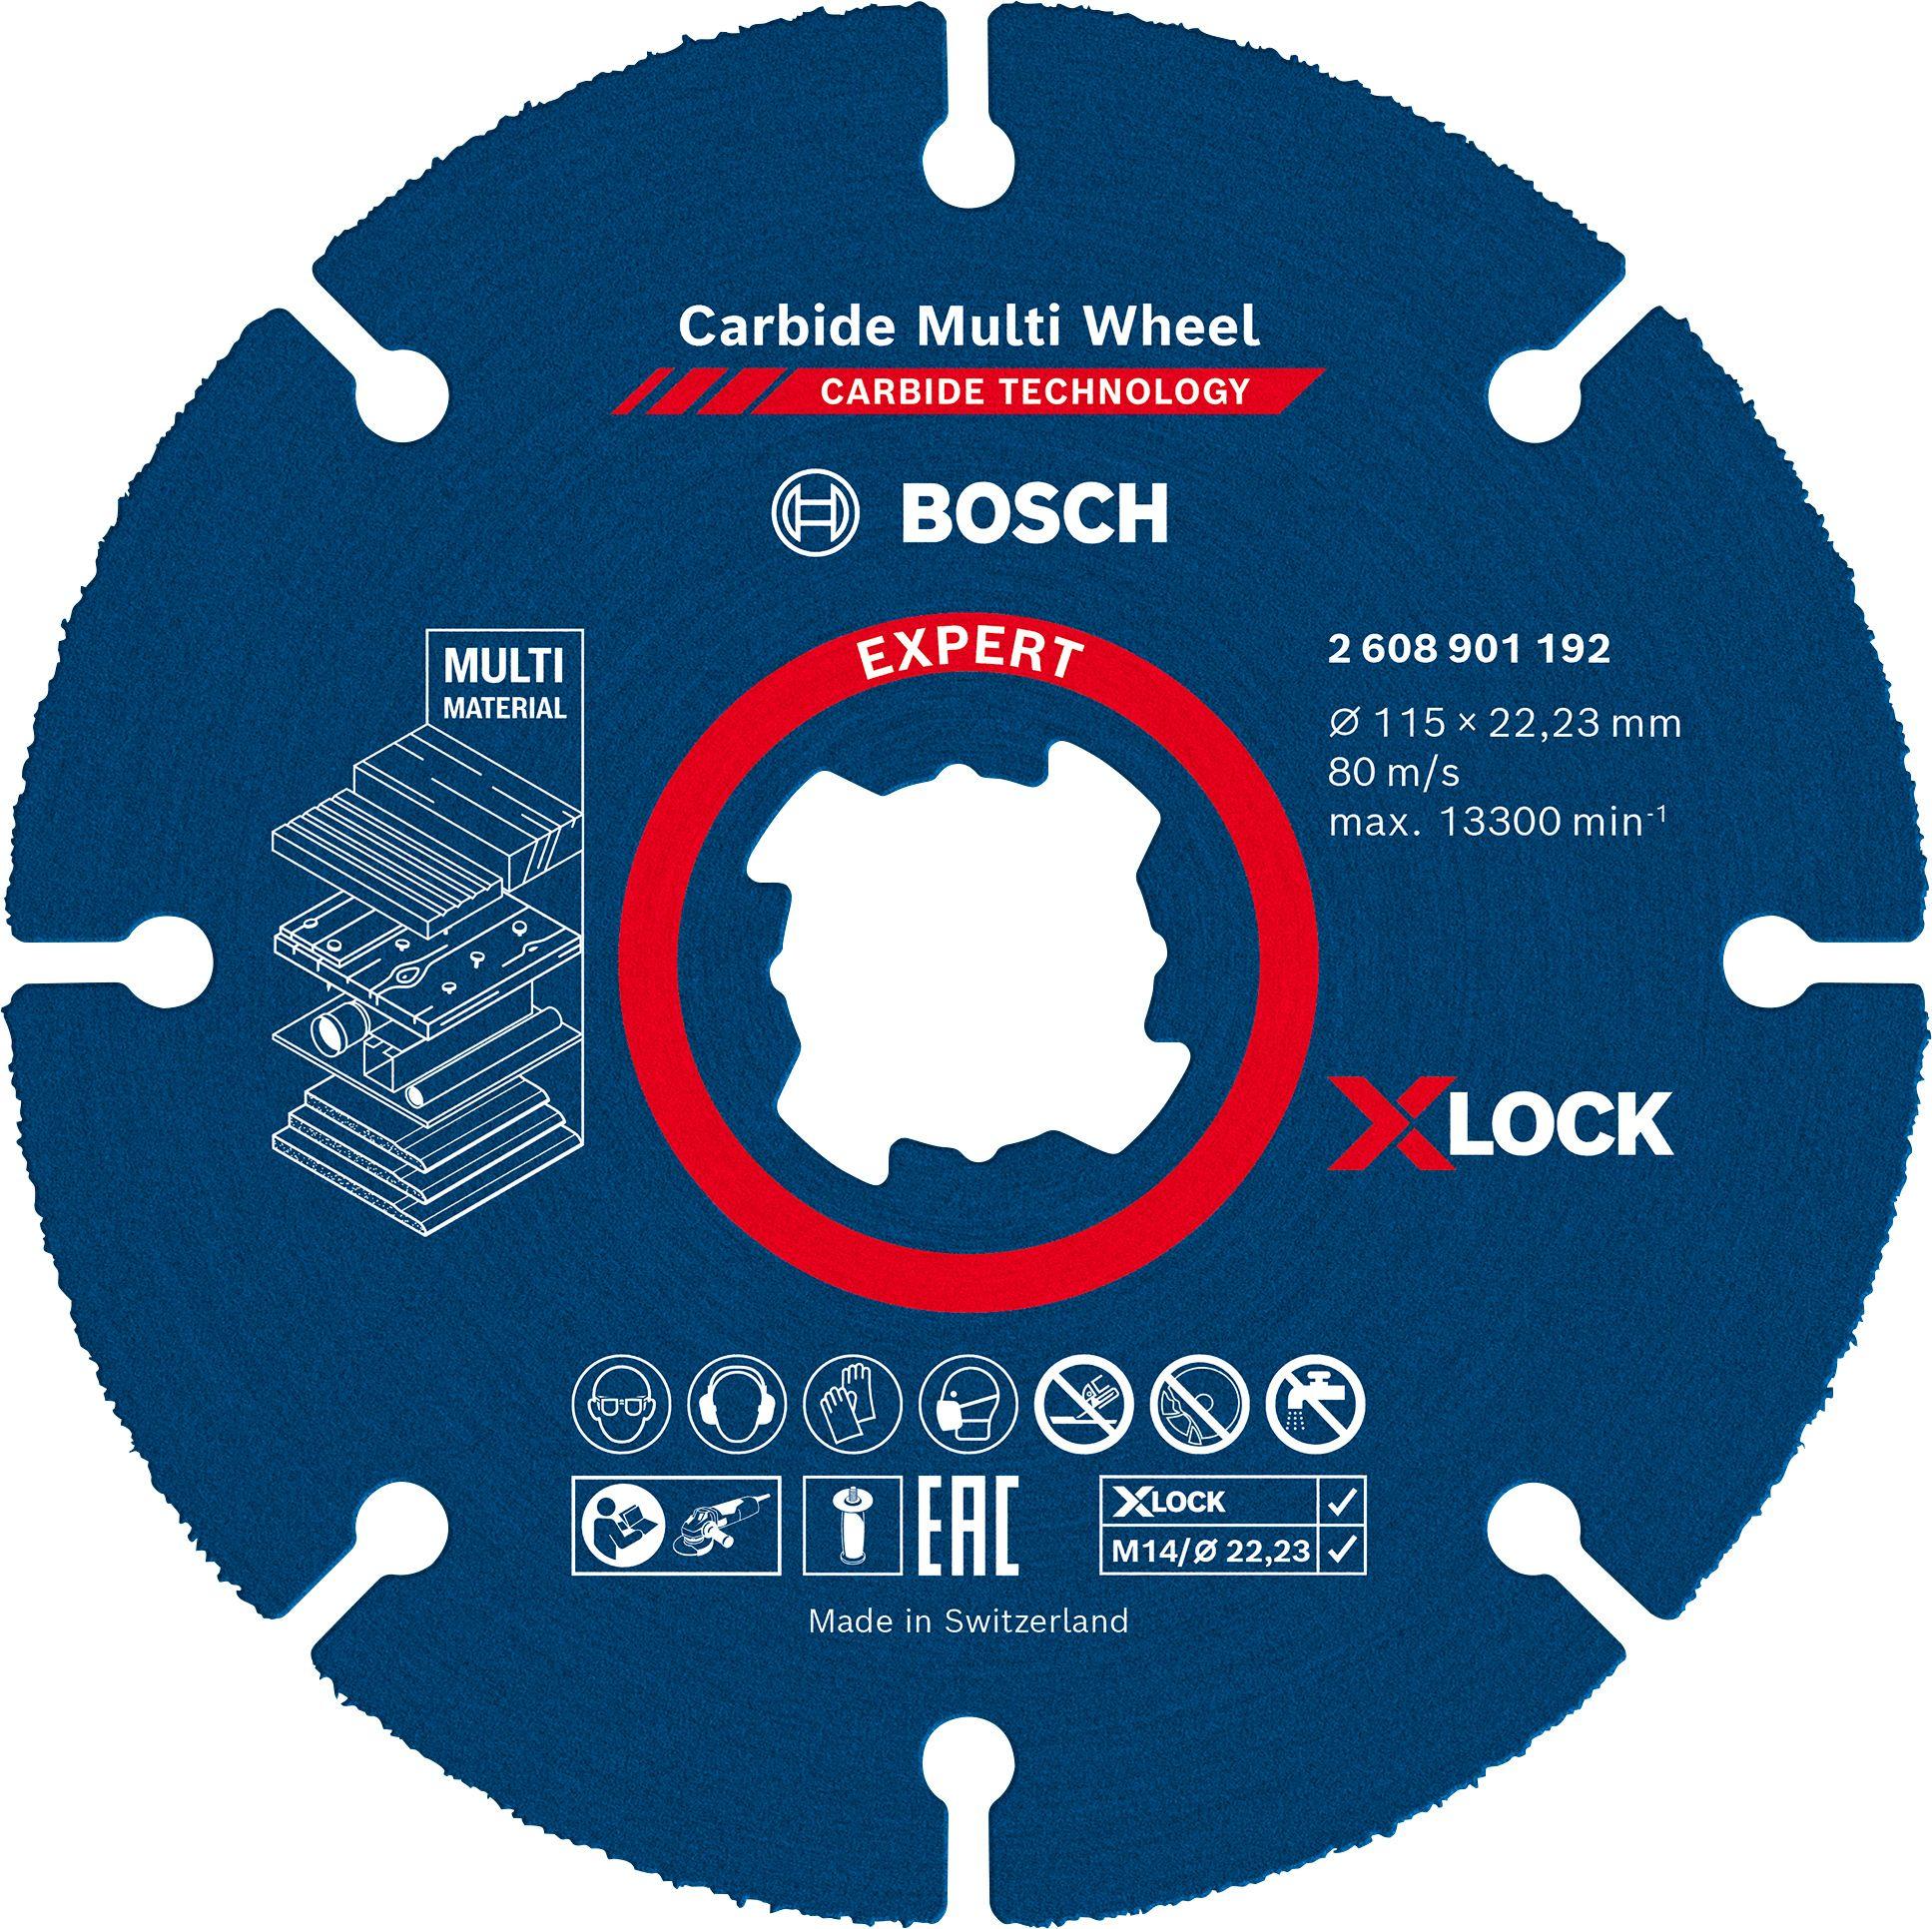 Expert Carbide Multi Wheel Cutting Discs